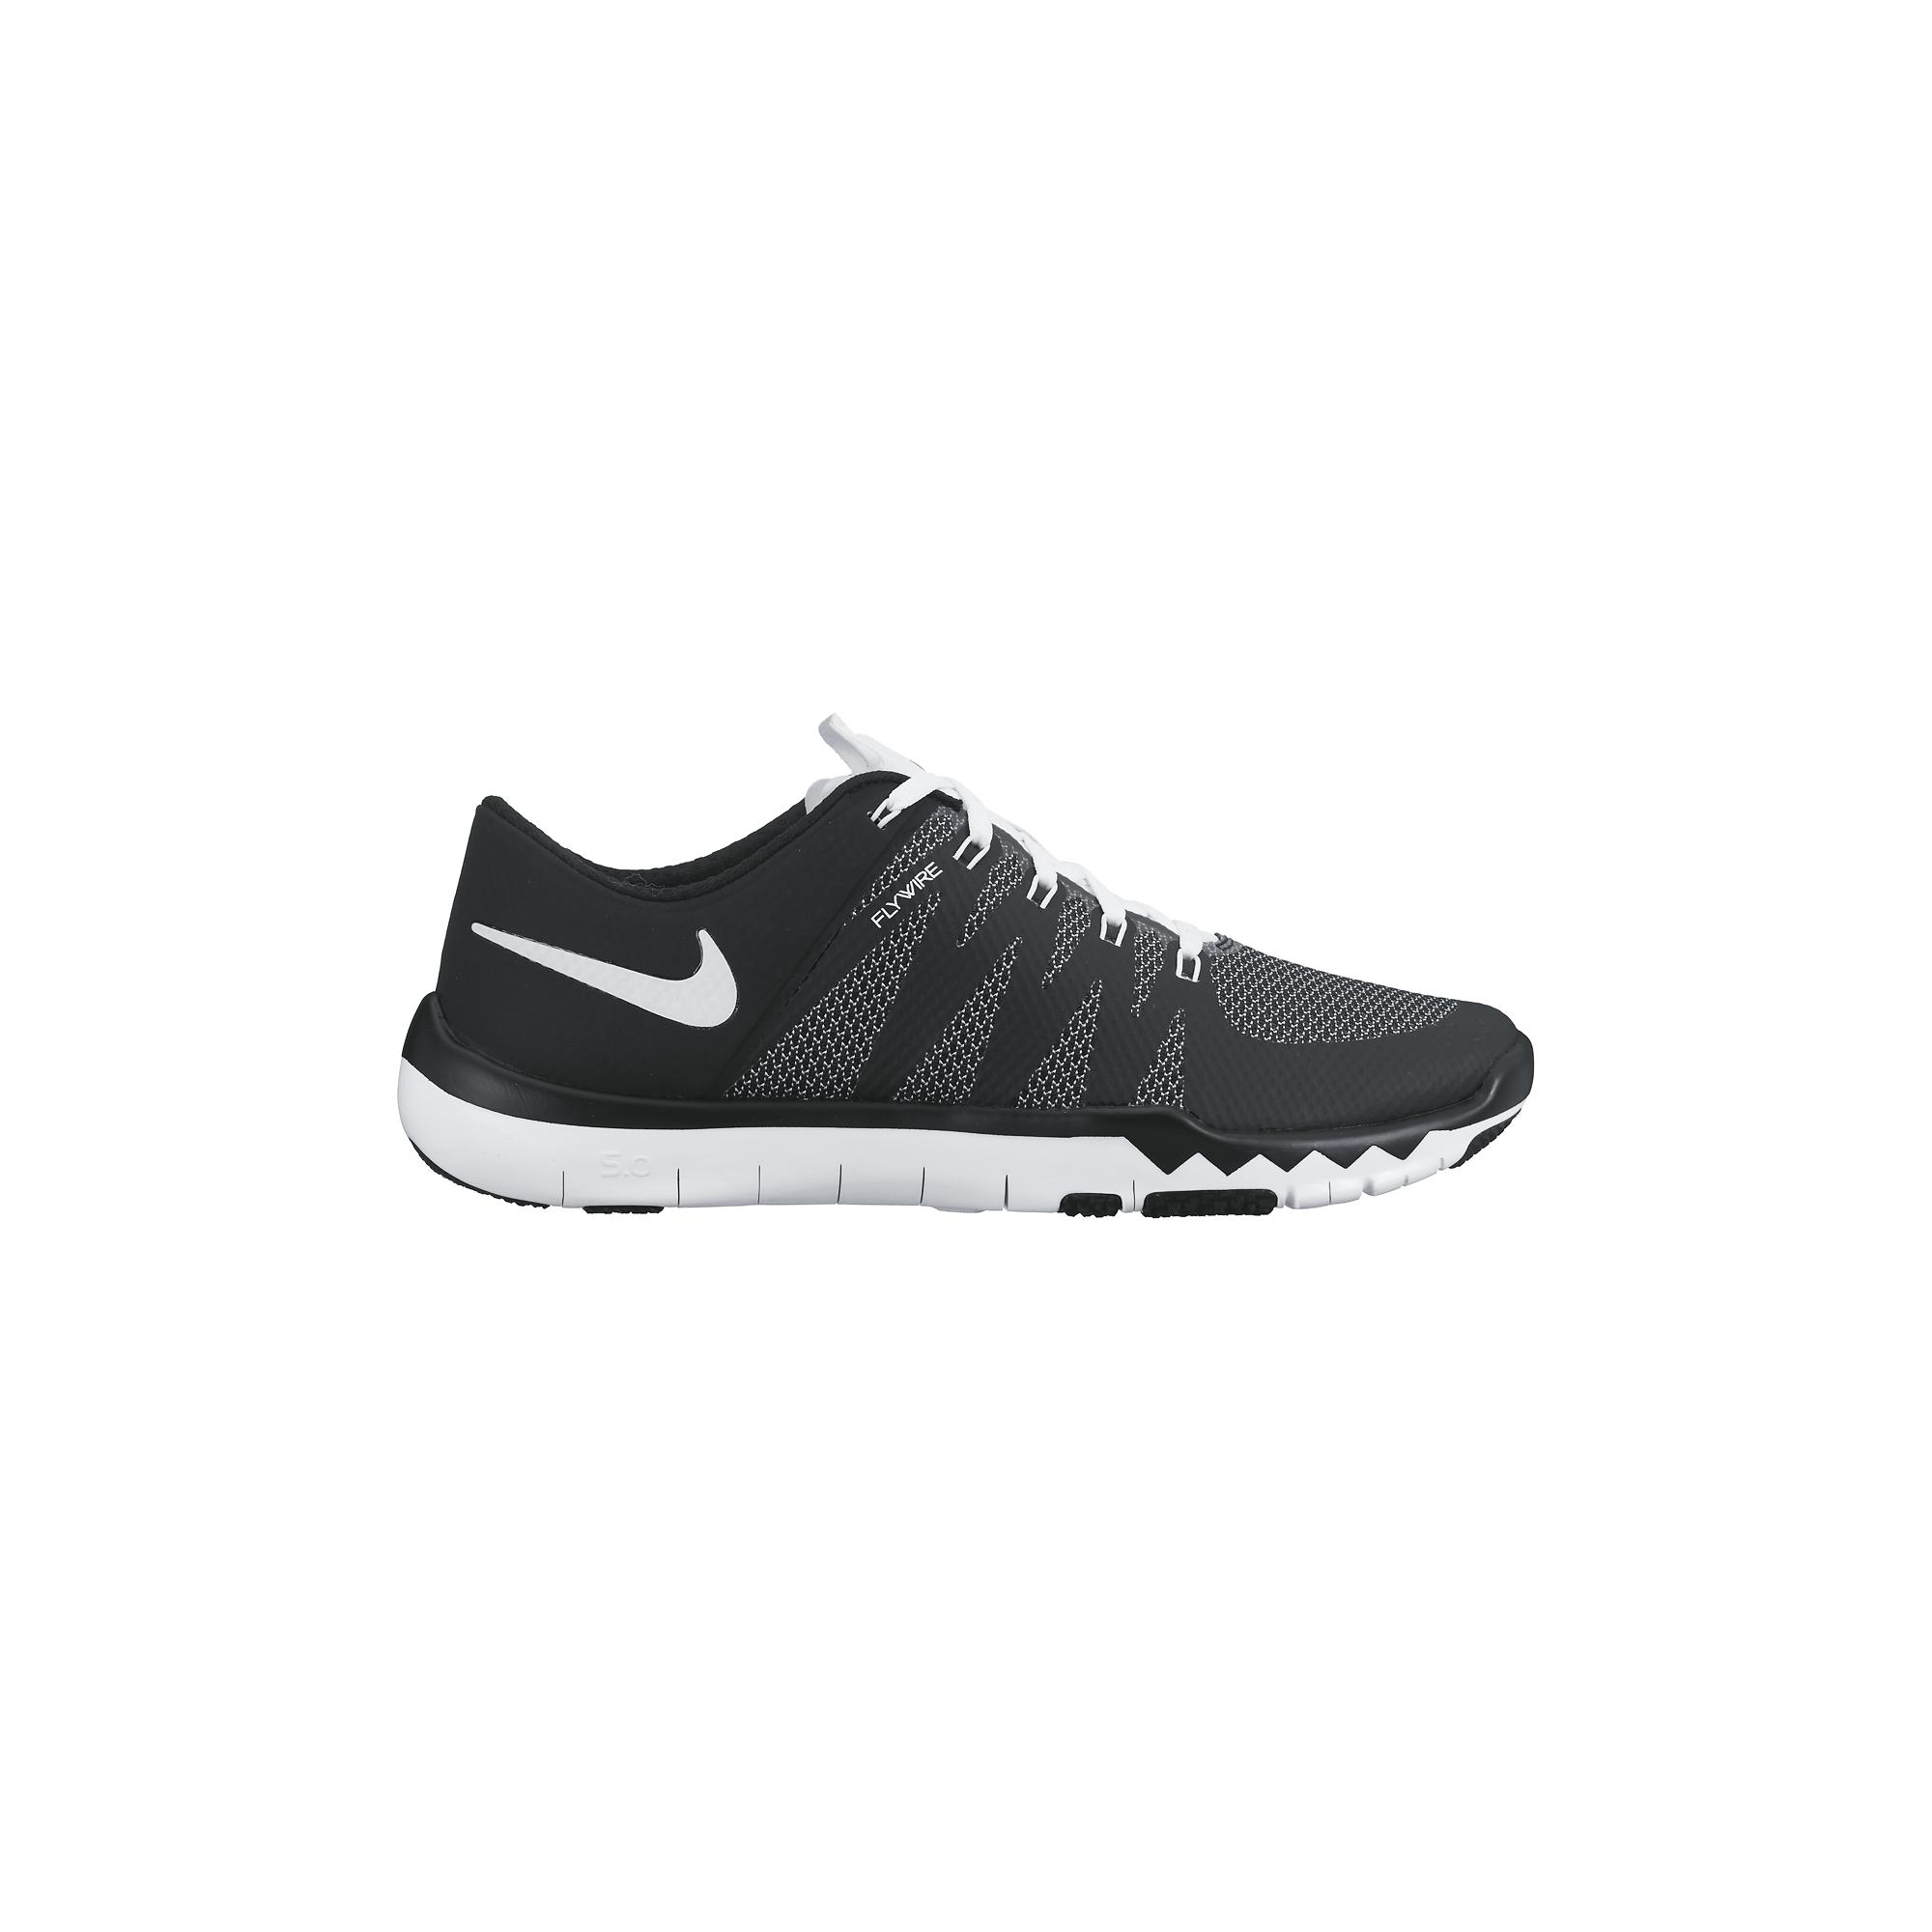 b7fbbfadb9 Nike Free Trainer 5.0 V6 Férfi Training Cipő 719922-006 Férfi Cipo /trainning-